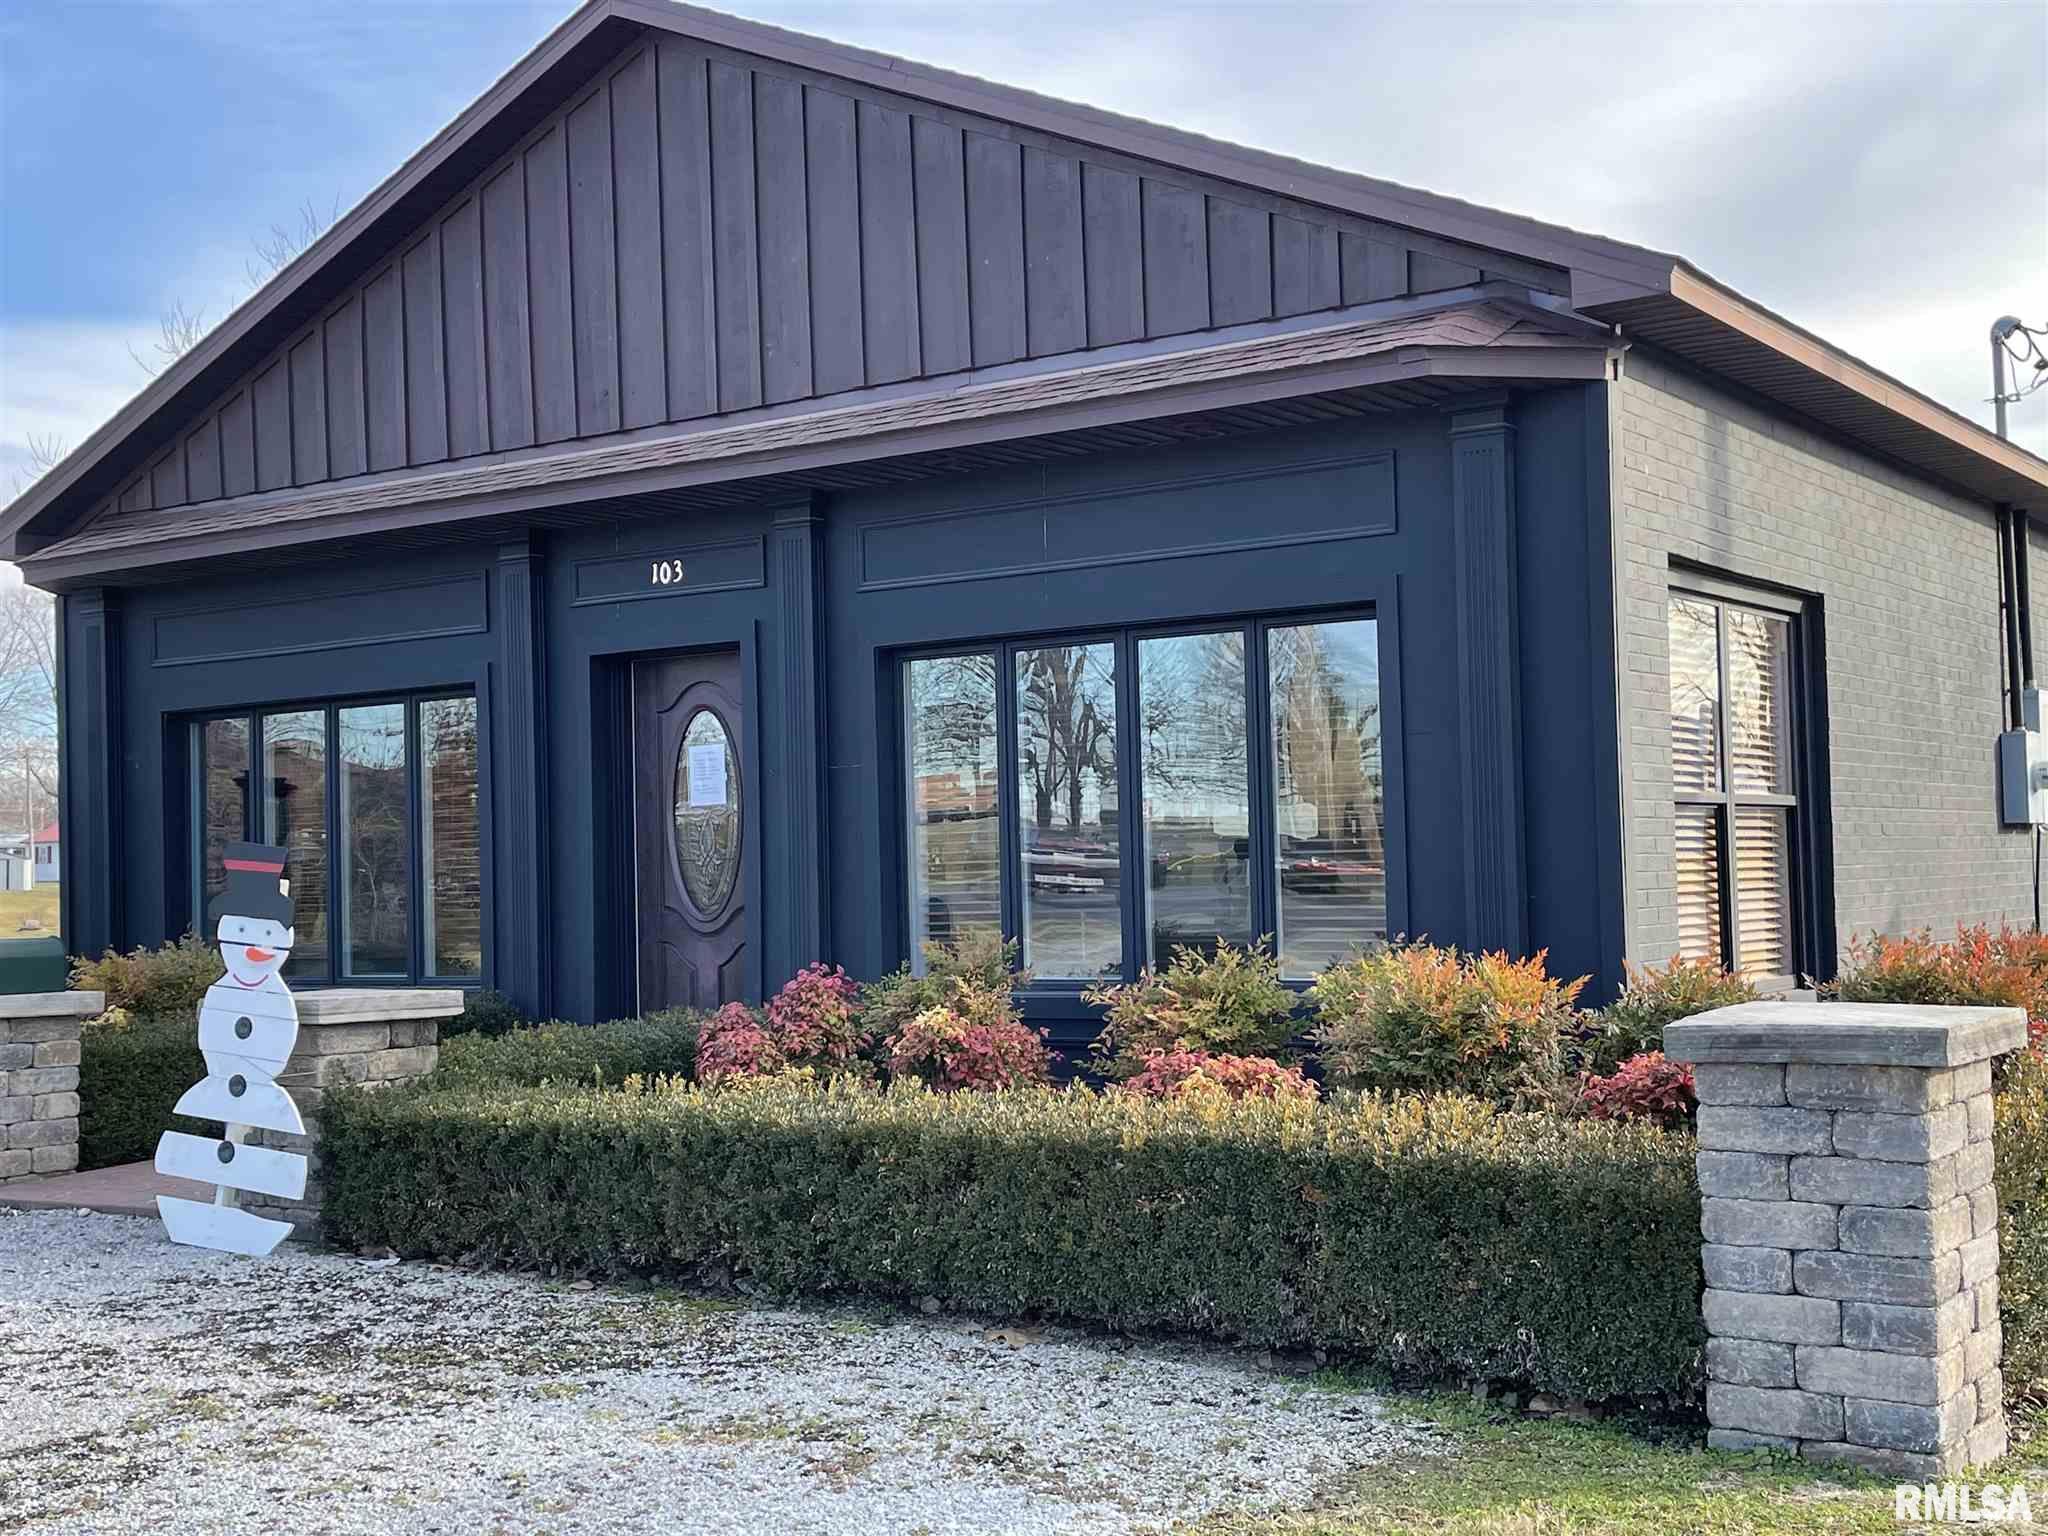 103 Transcraft Property Photo - Anna, IL real estate listing